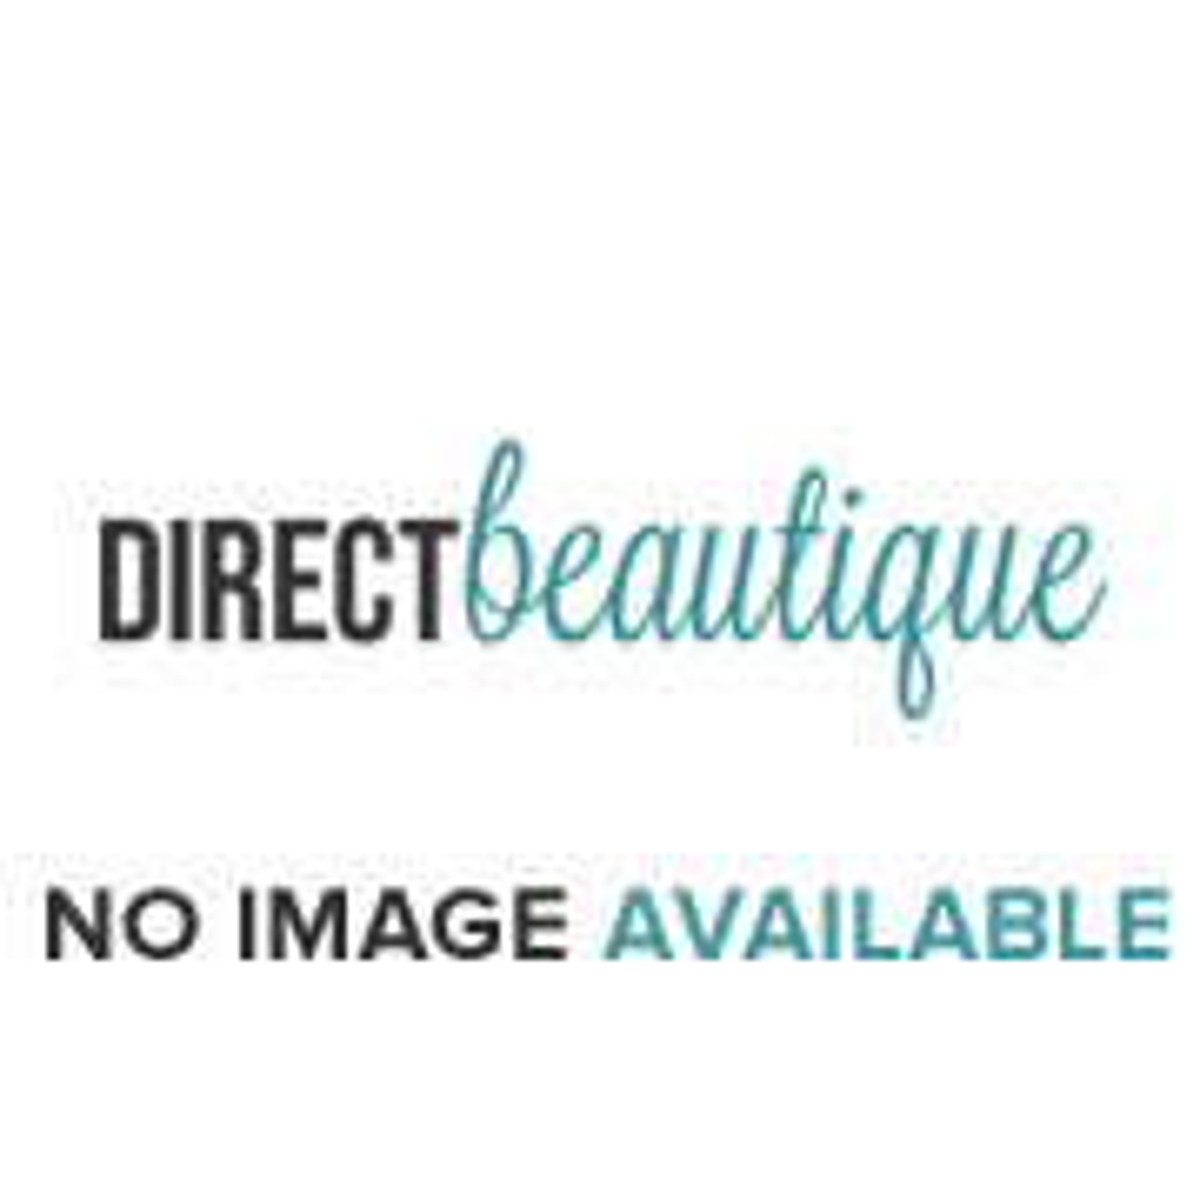 Repetto Mini Set - 2 x 5ml EDT / 2 x 5ml EDP